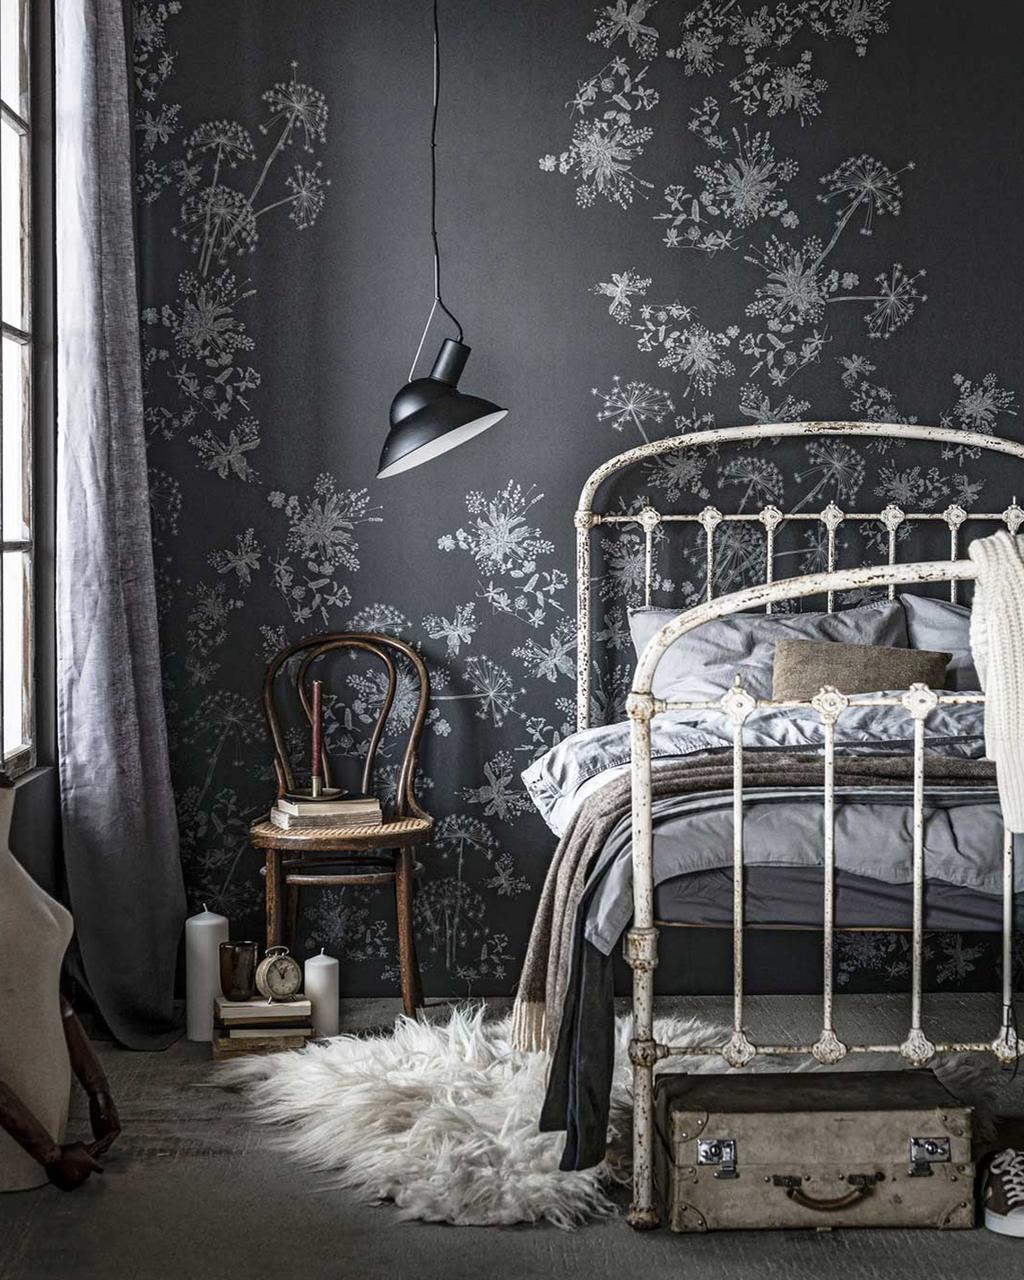 Winter warm bed